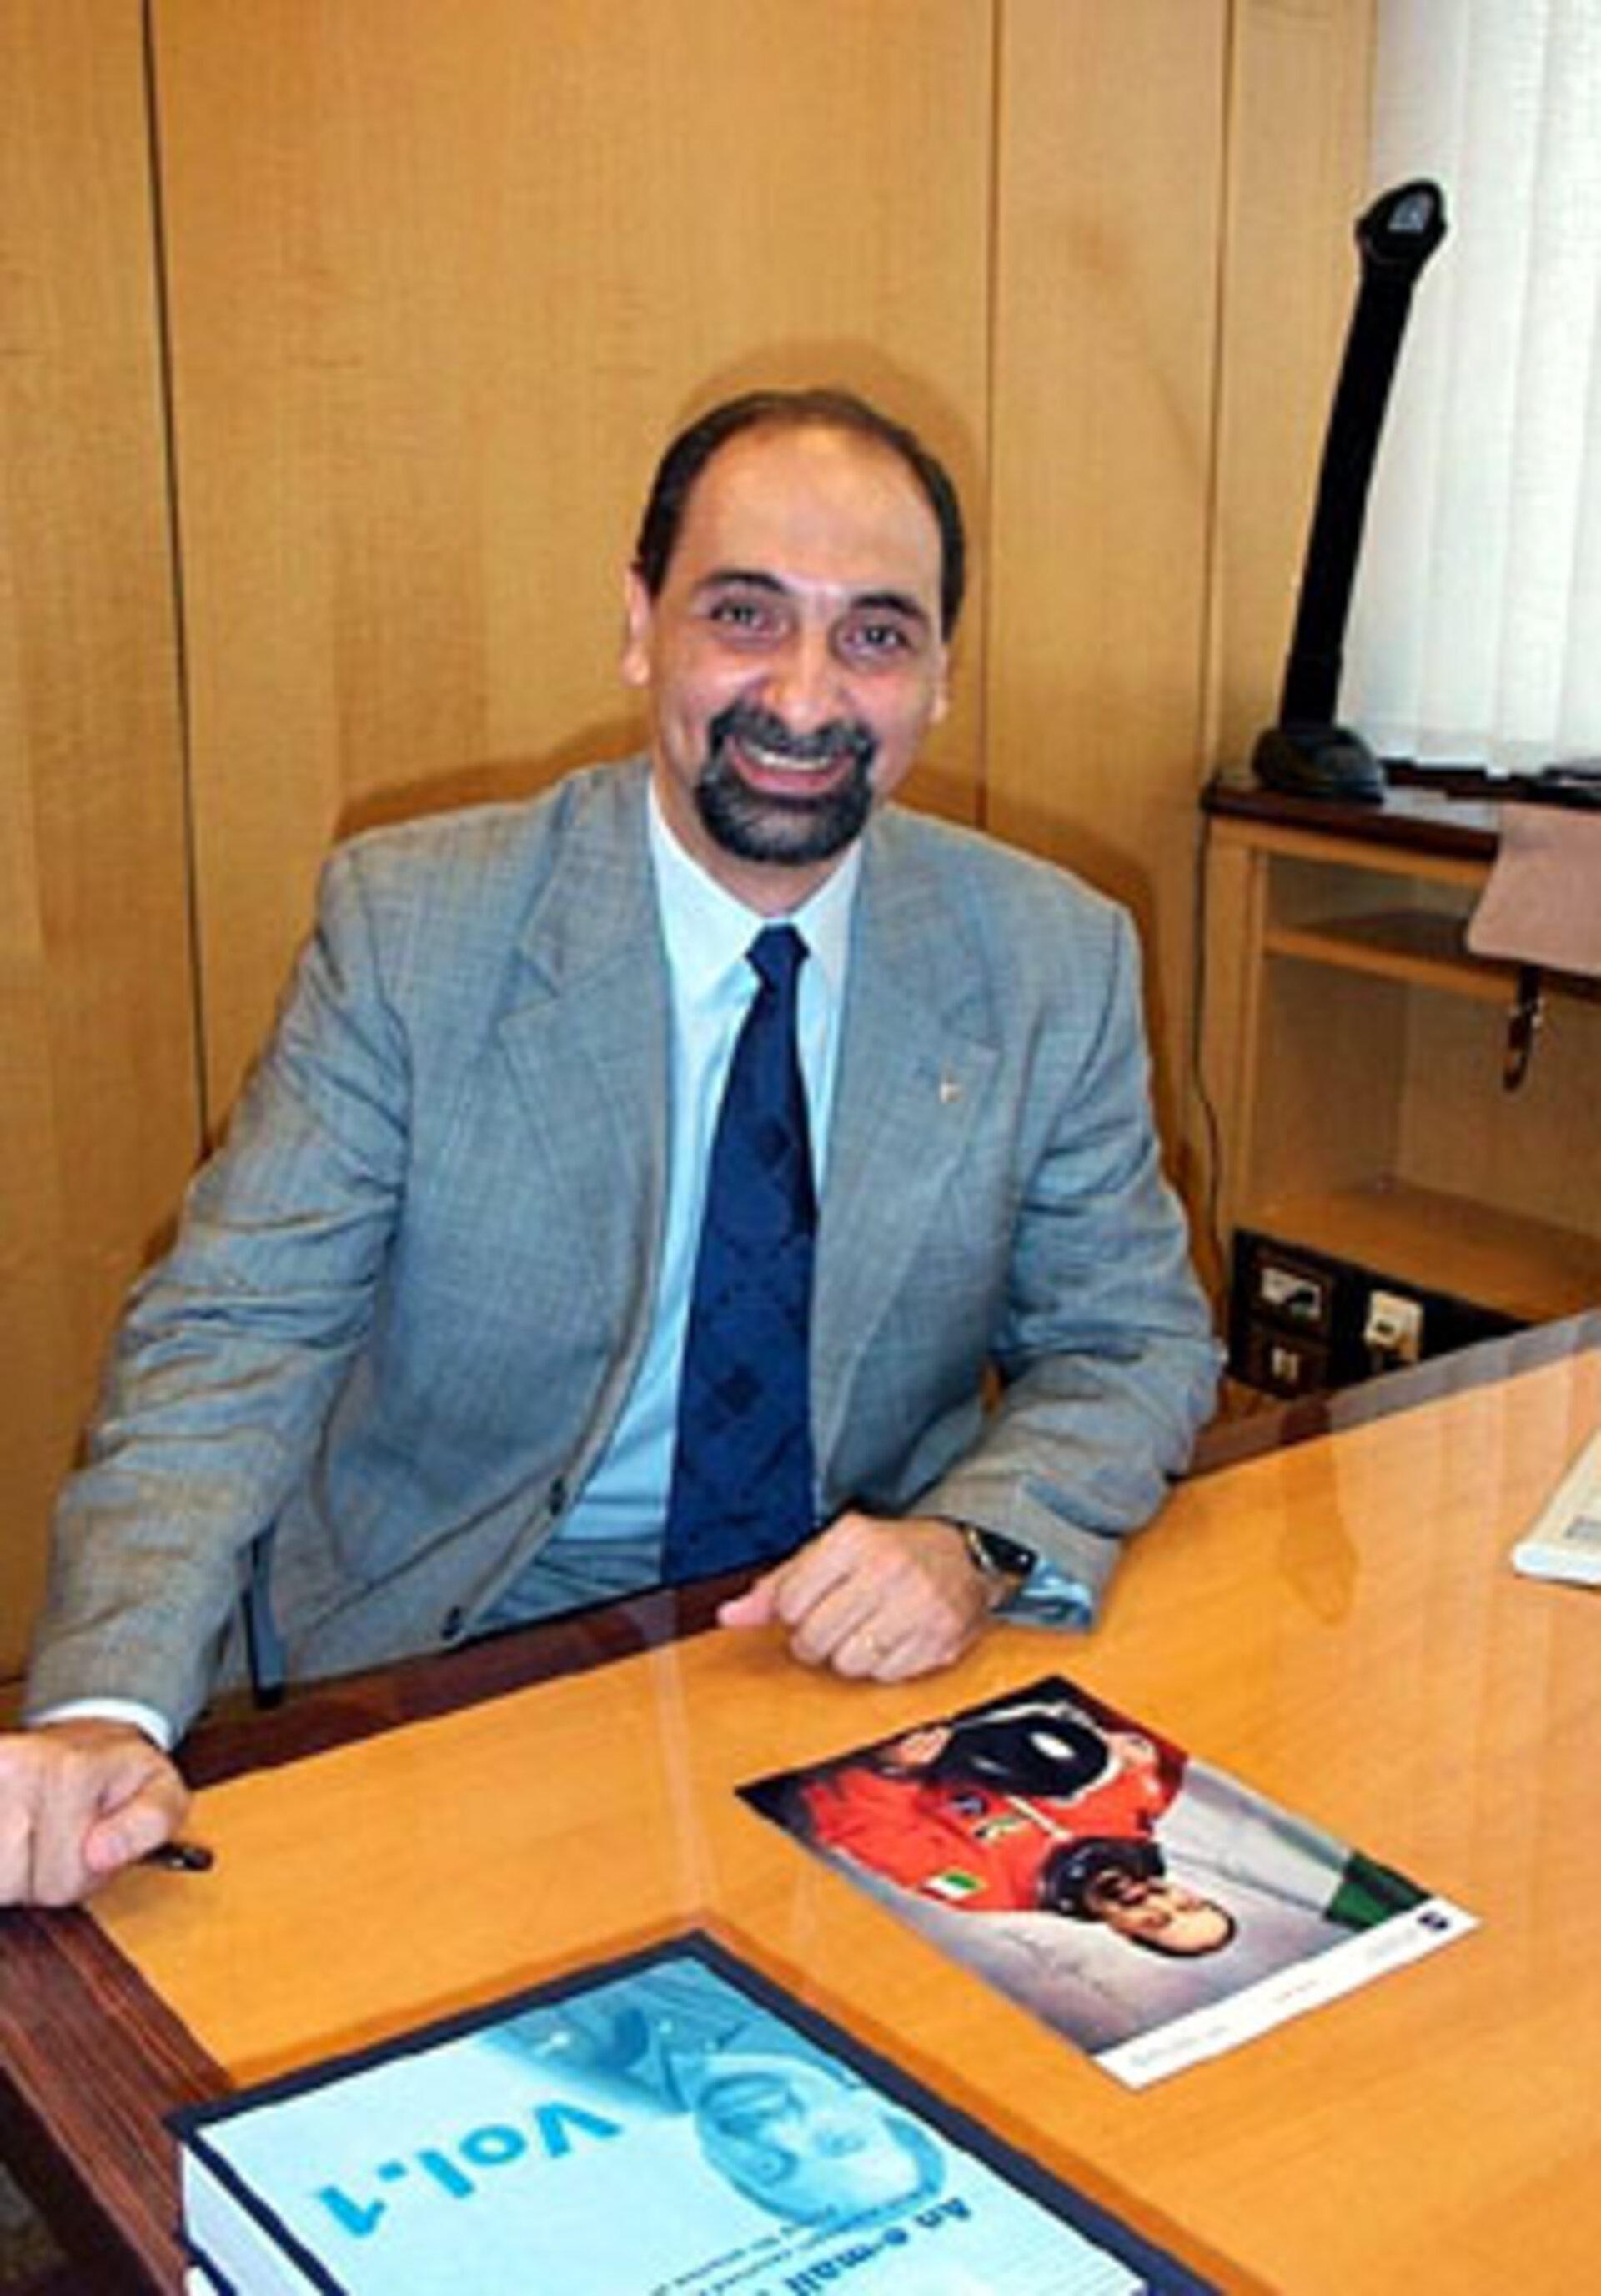 ESA - Umberto Guidoni visits ESRIN